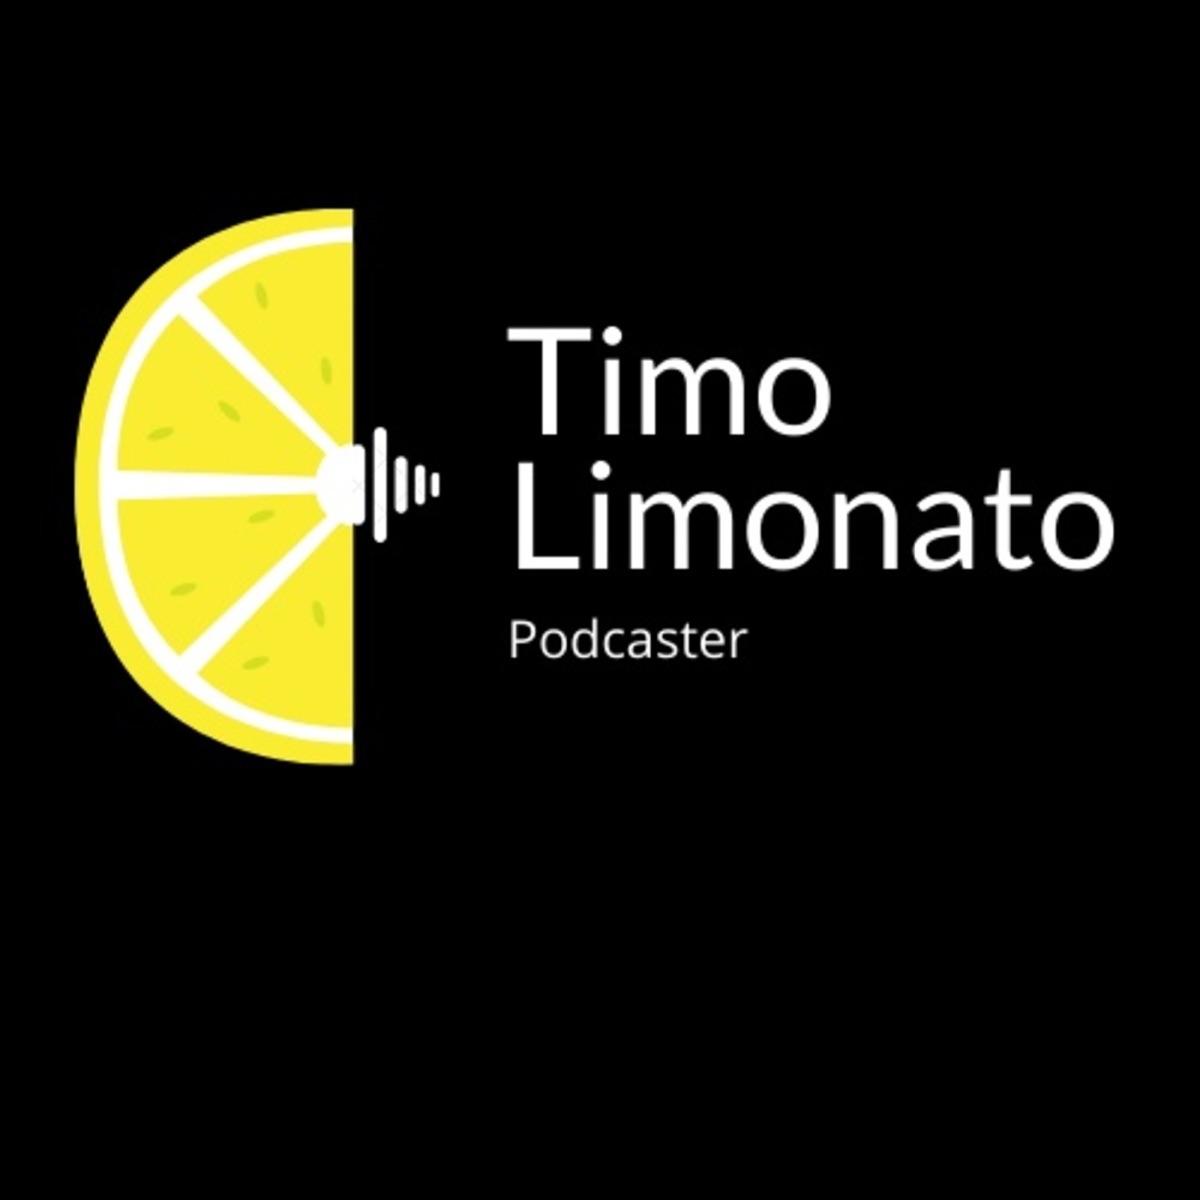 Timo Limonato